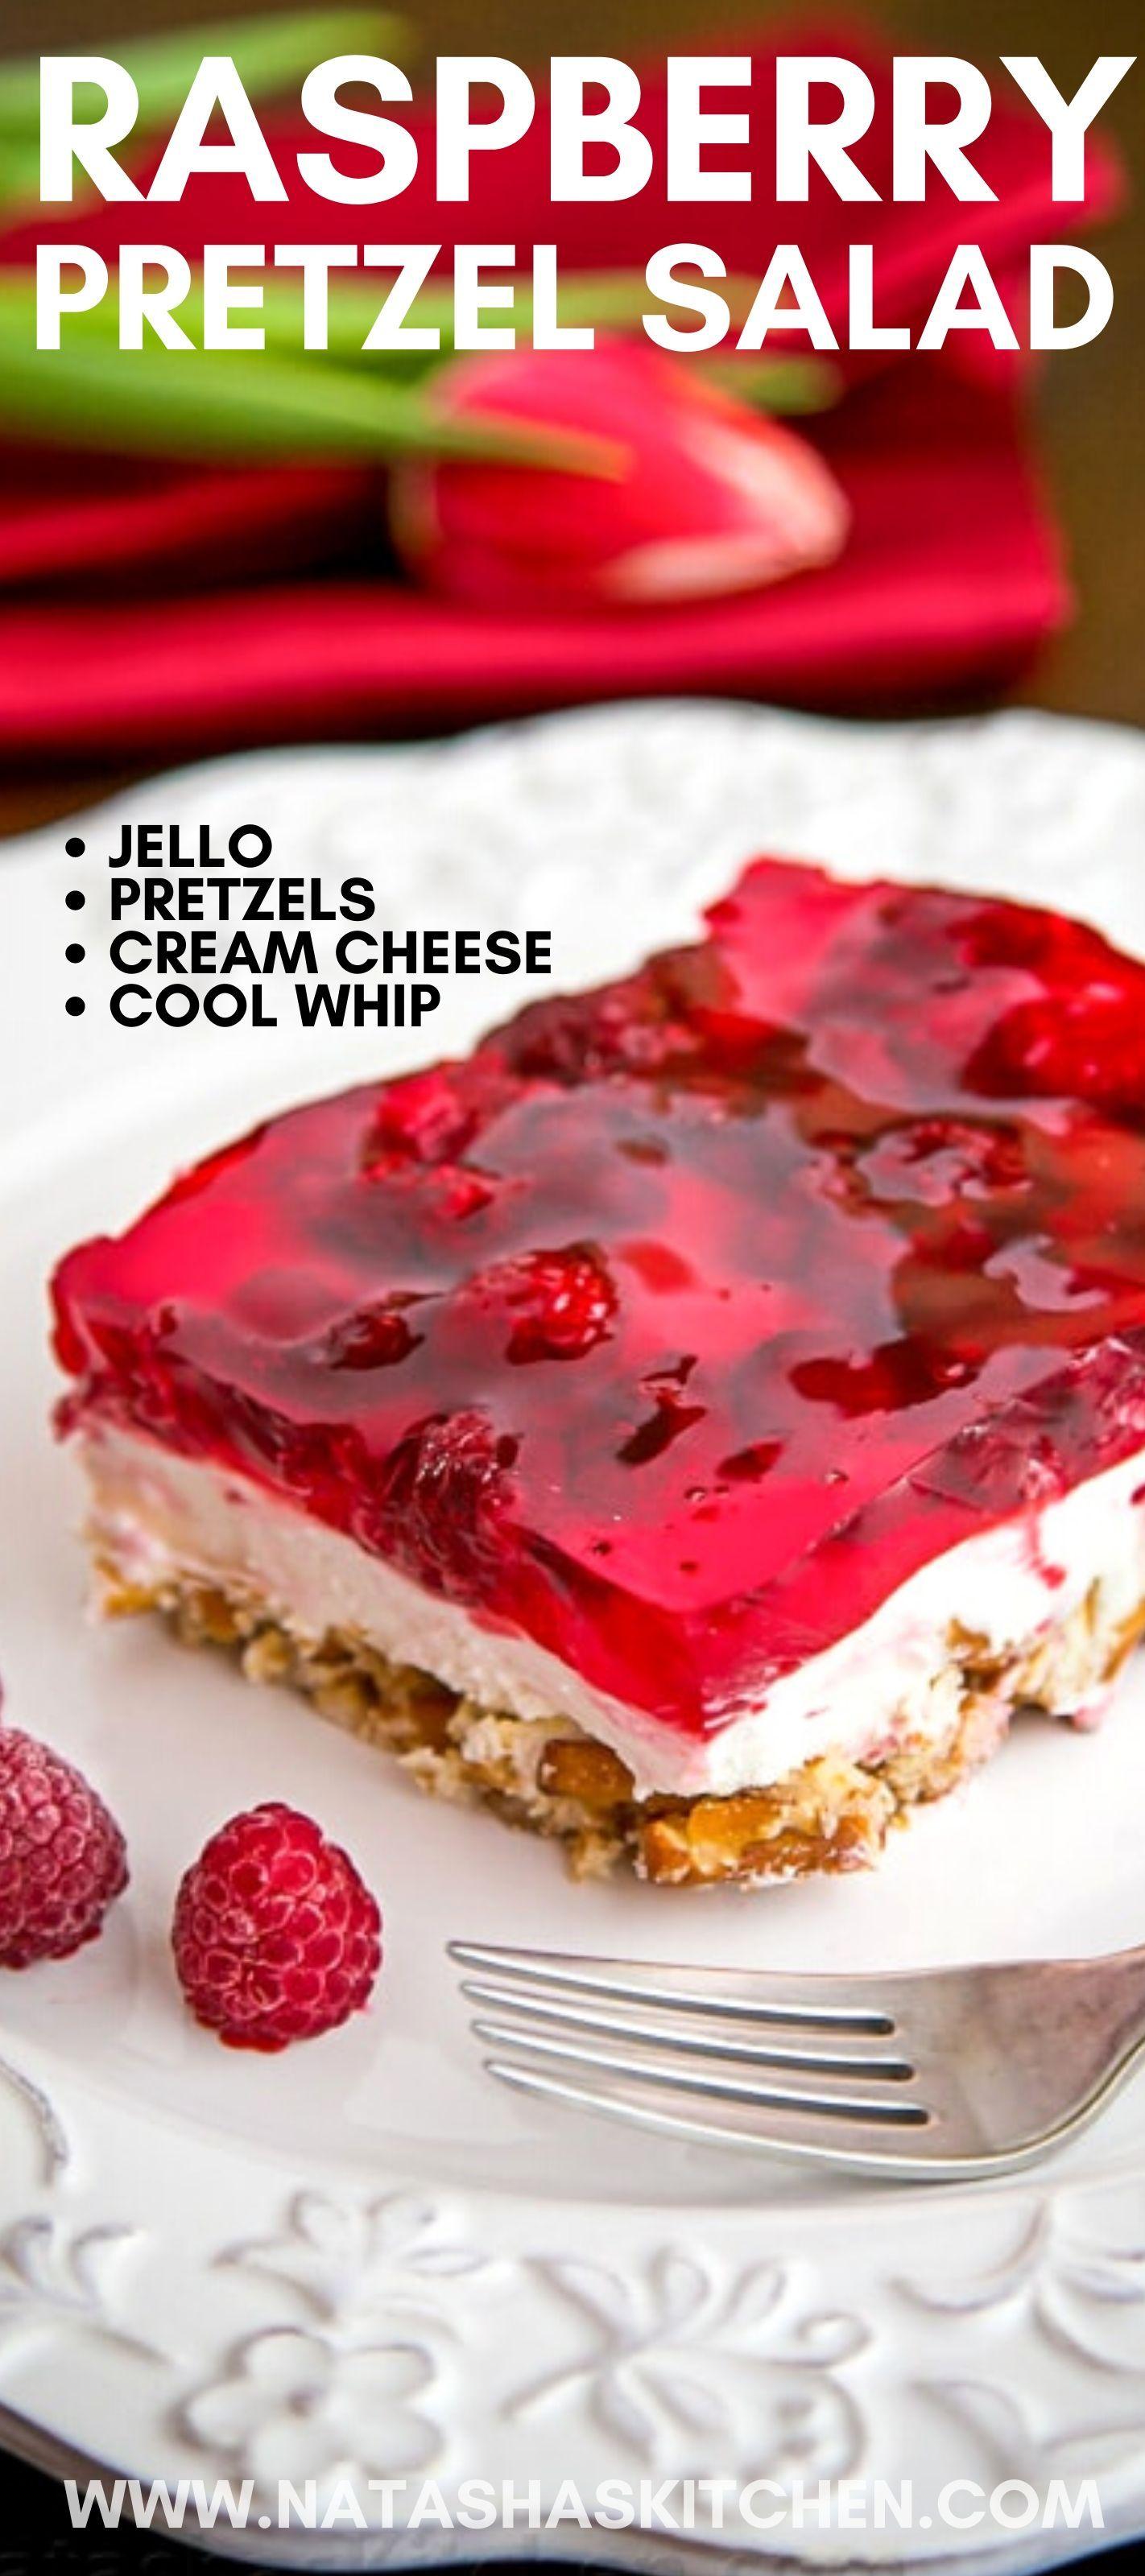 Raspberry Pretzel Jello Recipe A Fantastic Holiday Dessert Thanksgiving And Christmas Are The Most Popu Recetas De Gelatina Postres Navidenos Comida Postres